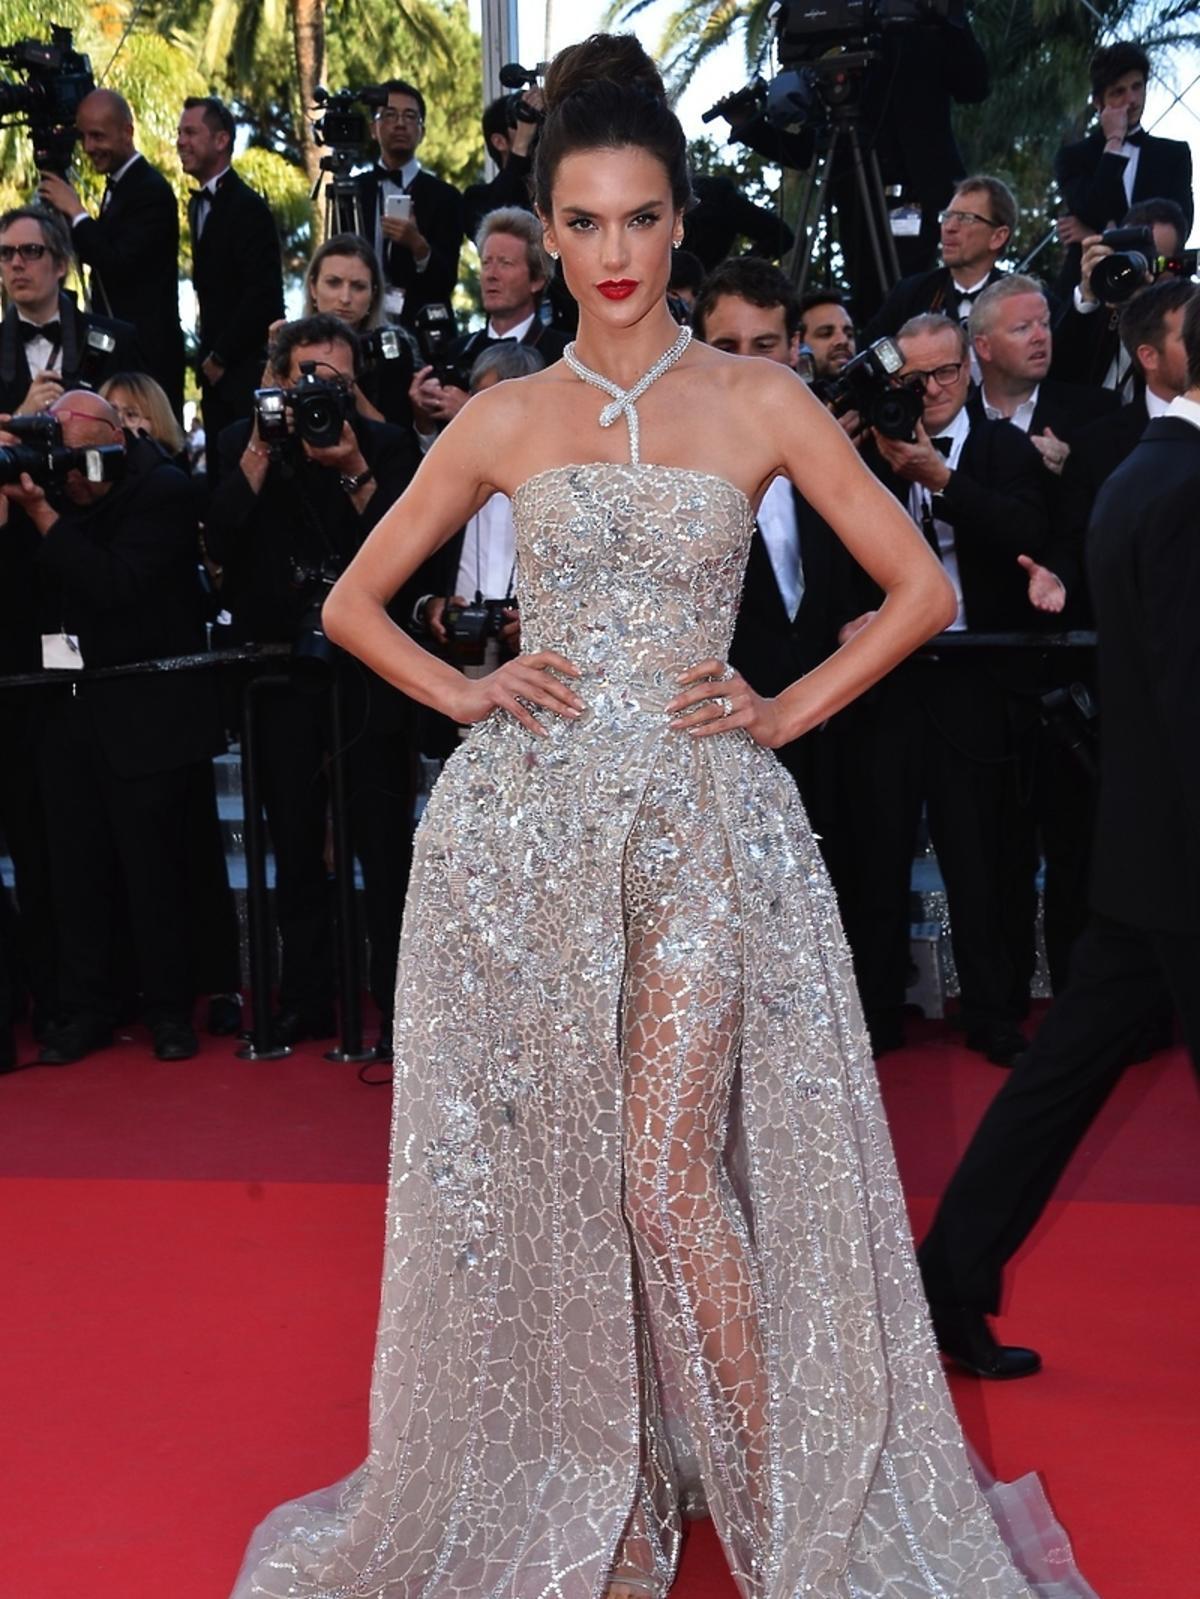 Alessandra Ambrosio w srebrnej sukni i spodniach